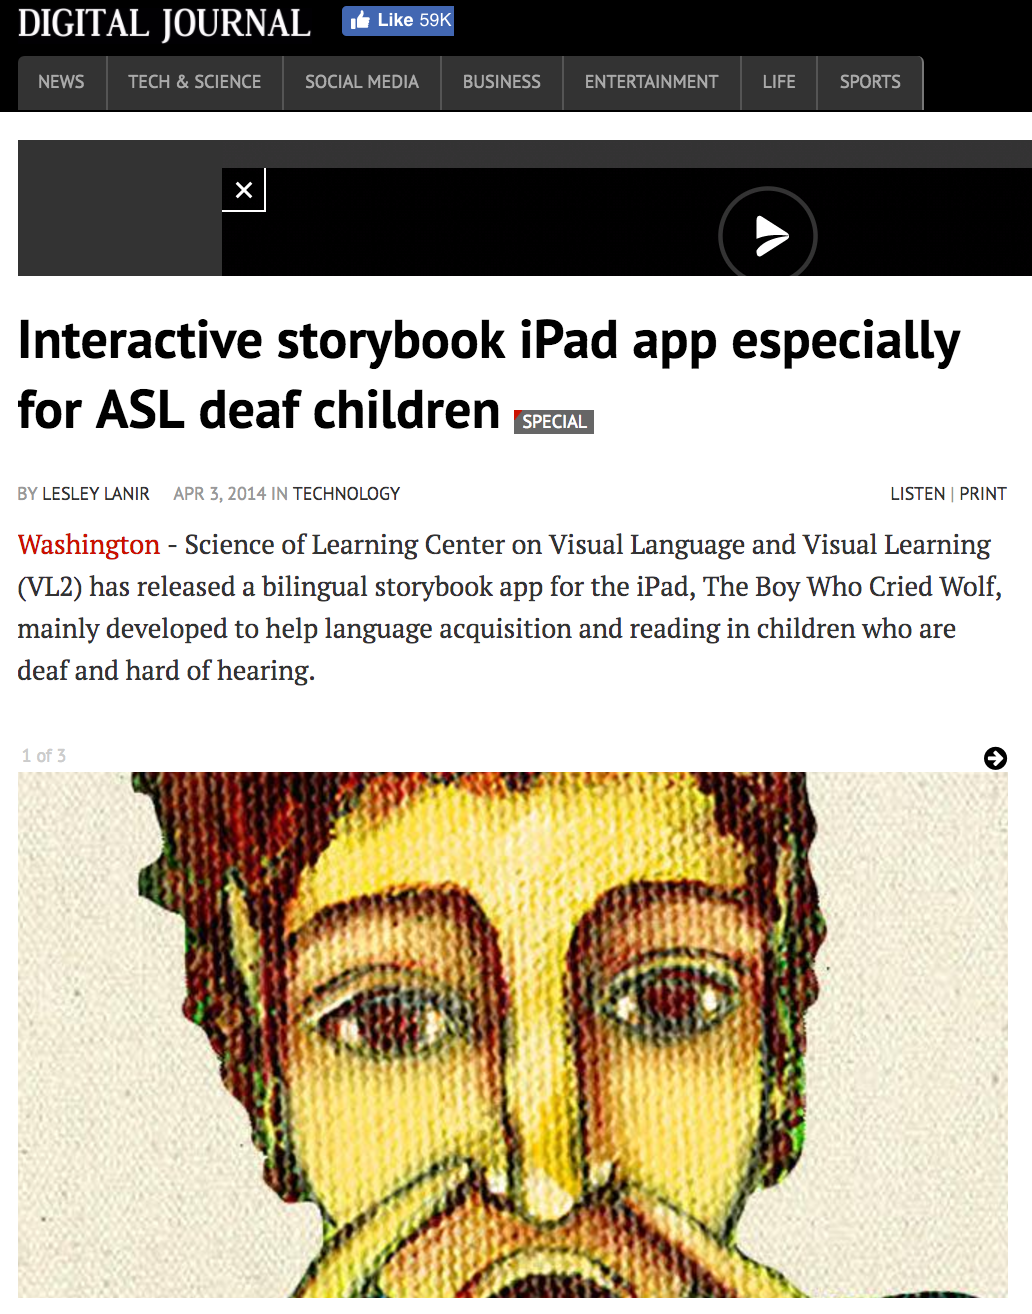 Press & Reviews — VL2 Storybook Apps